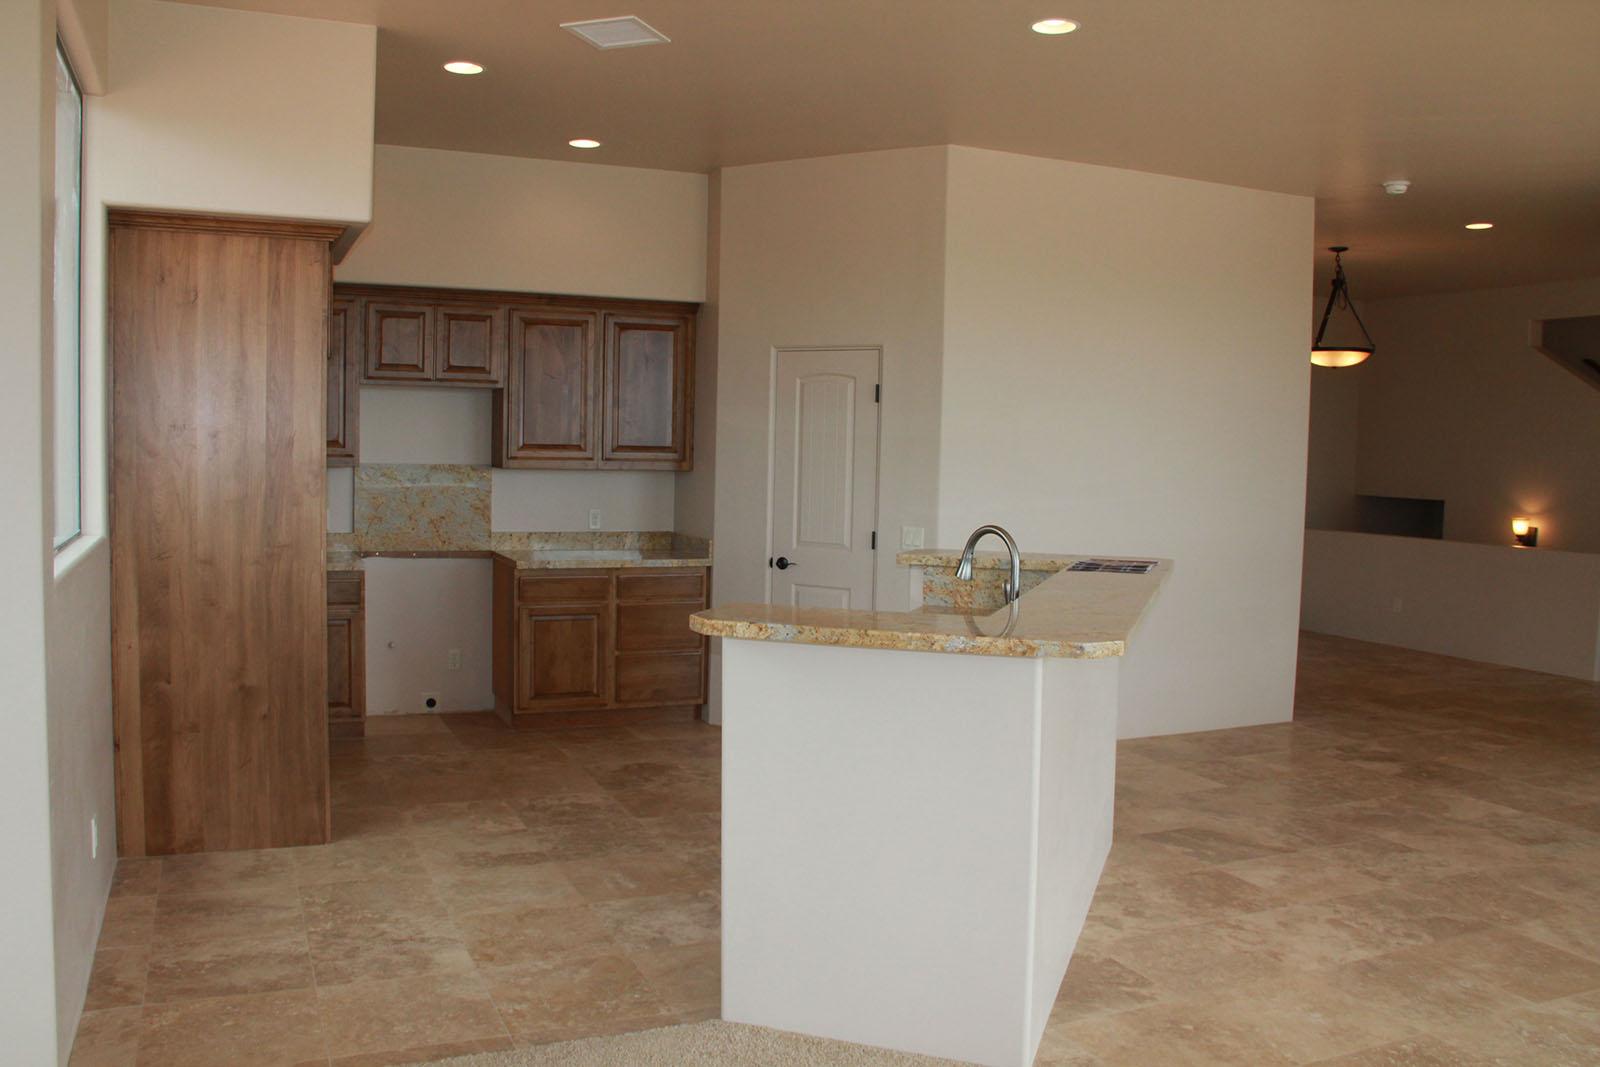 530-windsong-torel-custom-homes-sedona-arizona-0141-jpg